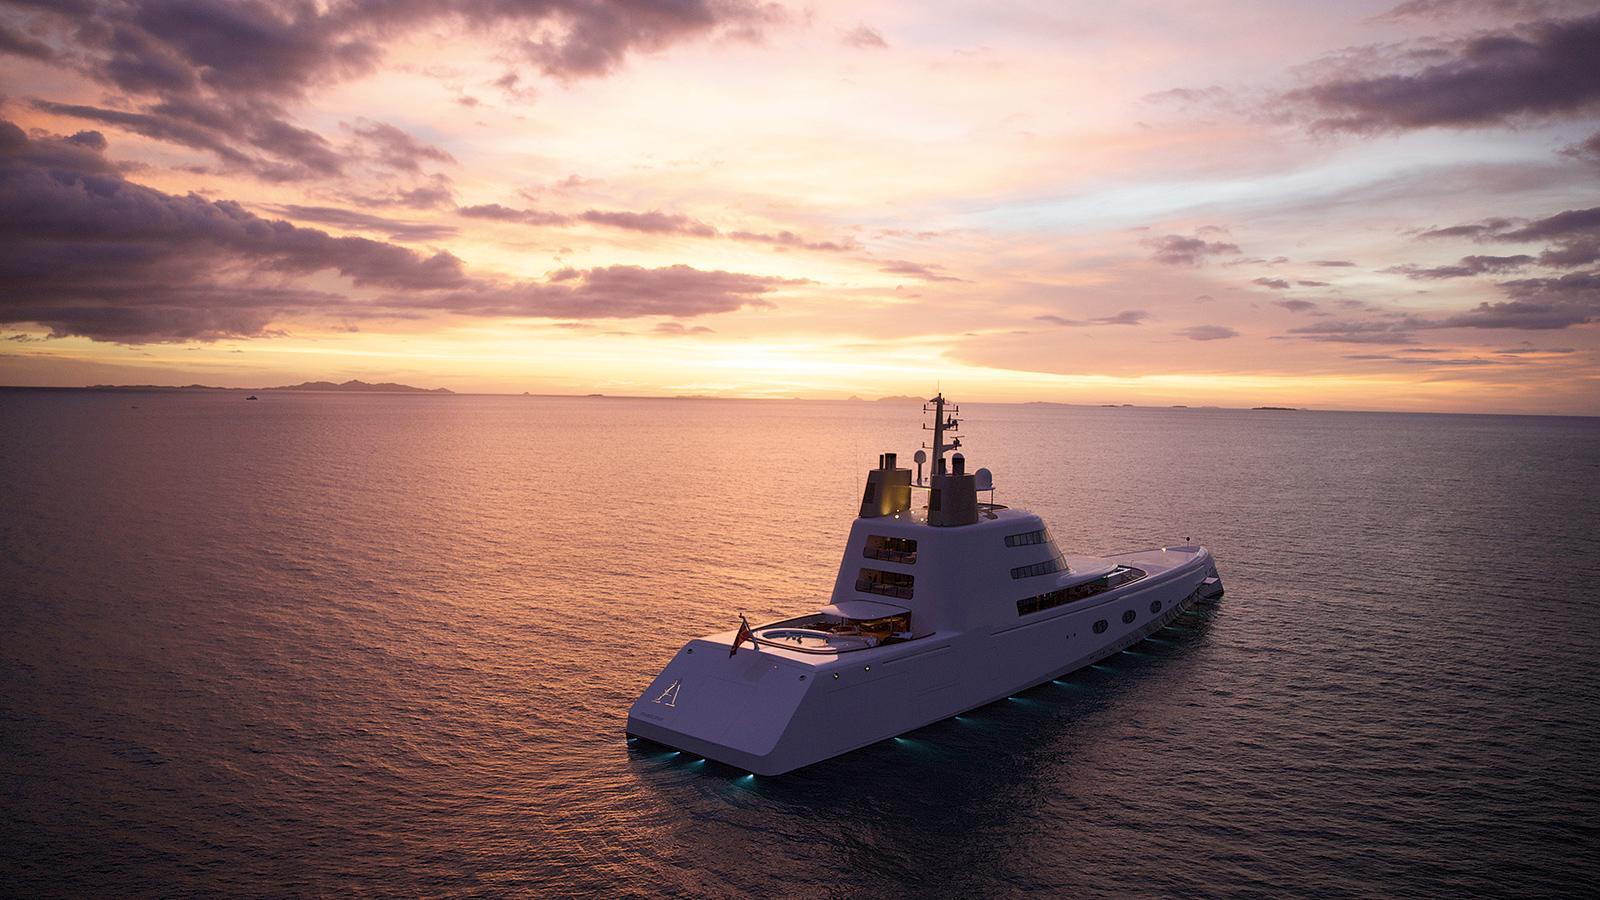 superyacht-a-motor-yacht-blohm-voss-2008-119m-aerial